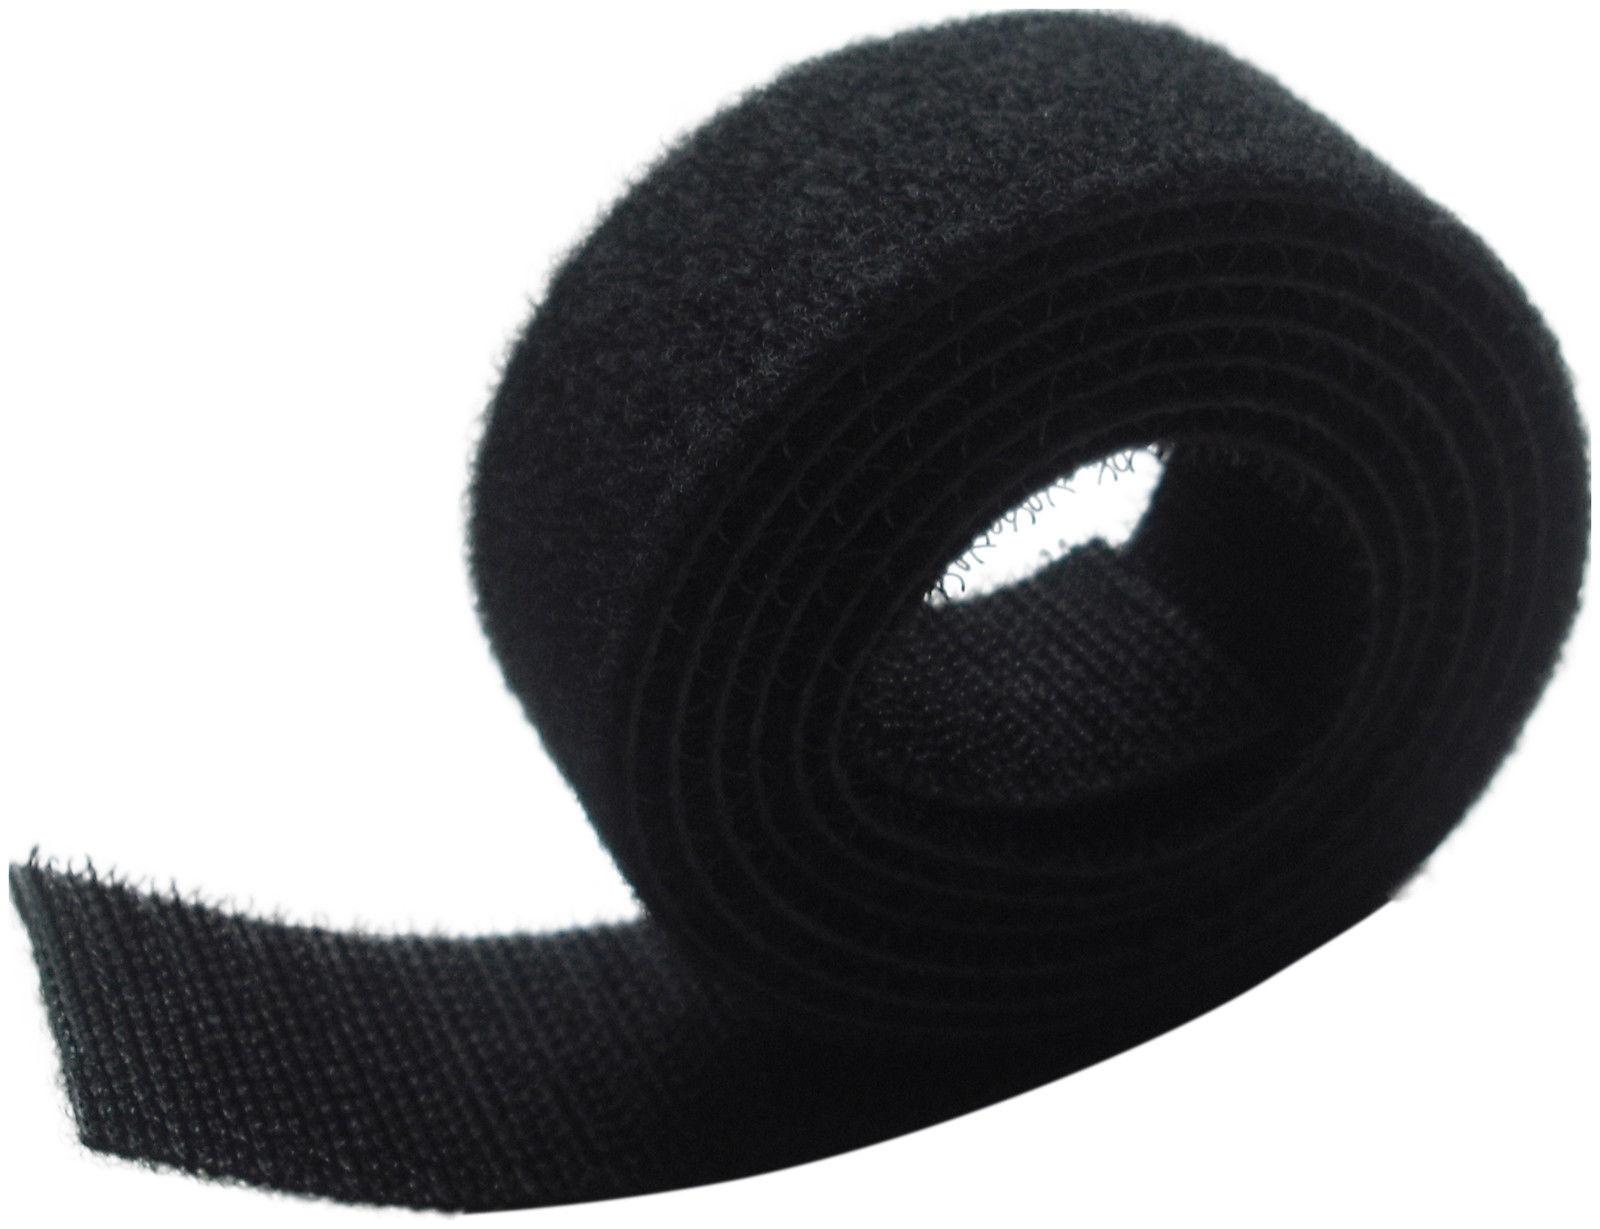 SELF GRIP HOOK & LOOP CABLE TIES 50MM WIDE STRAPPING X 1M LONG